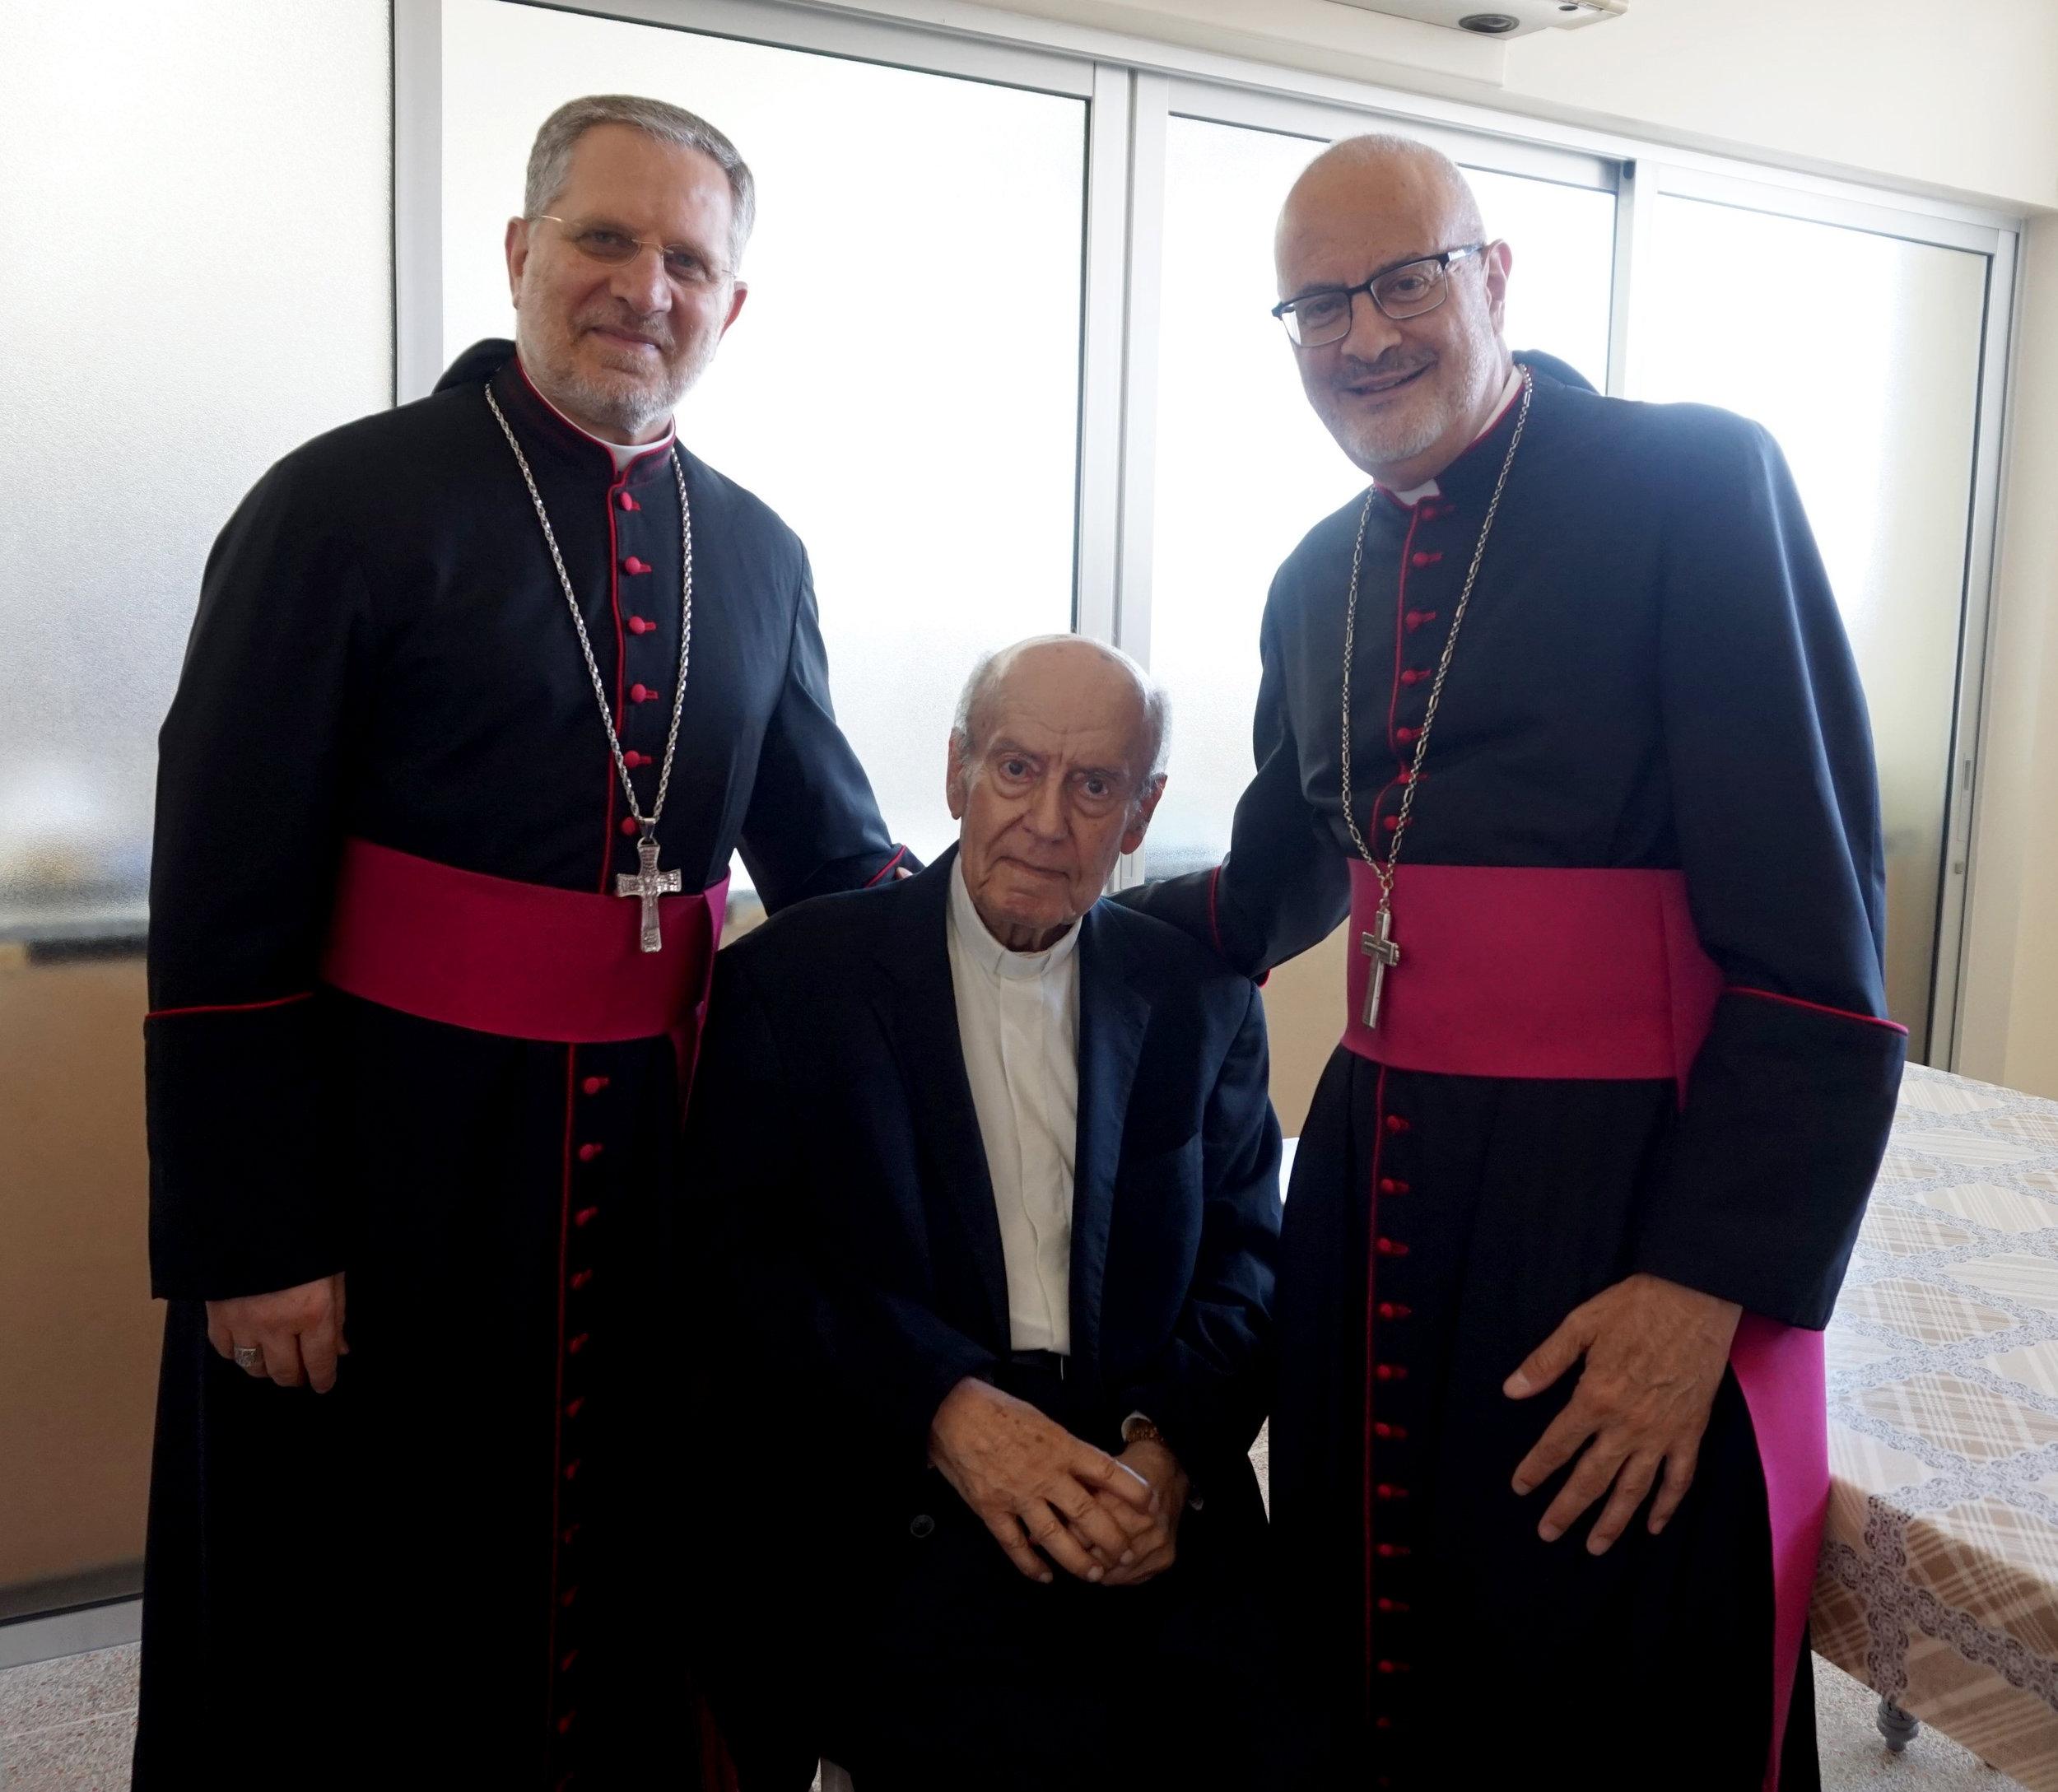 Bishop Michel Aoun (Jbeil Eparchy) and Bishop Gregory Mansour with Monsignor Sami Hayek in Lebanon, Summer 2019.